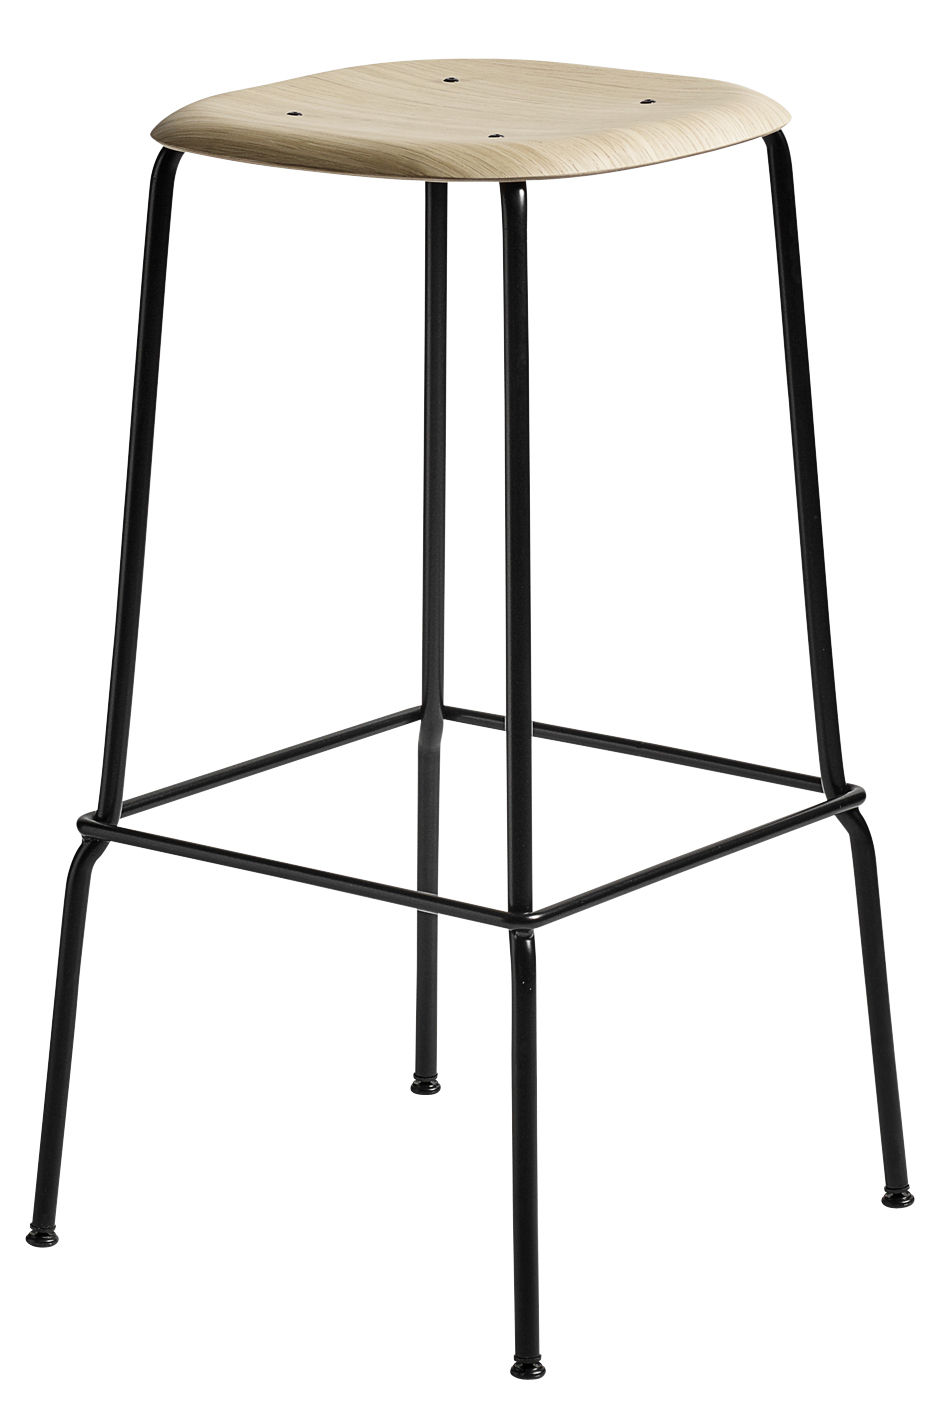 Furniture - Bar Stools - Soft Edge 30 High stool - H 75 cm / Wood & metal by Hay - Oak / Black leg - Lacquered steel, Varnished oak plywood